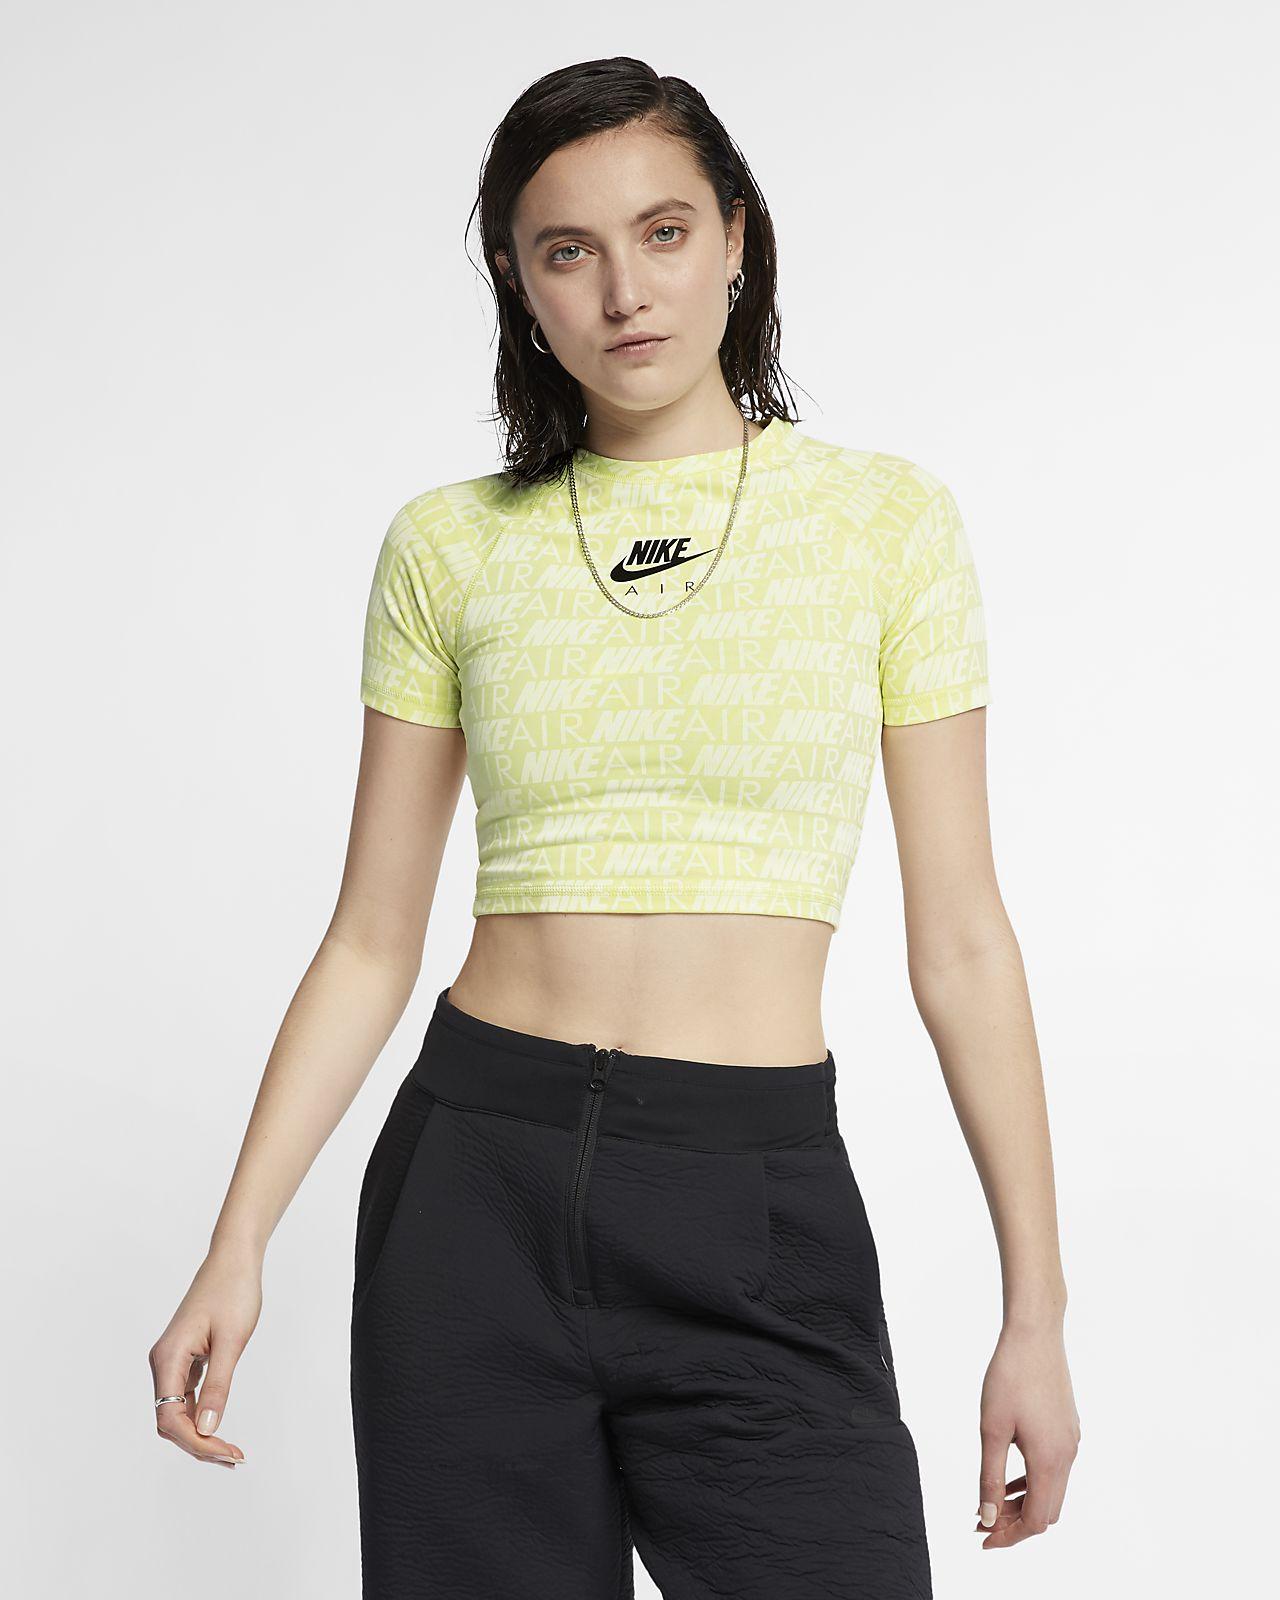 Nike Air Camiseta de manga corta con estampado - Mujer